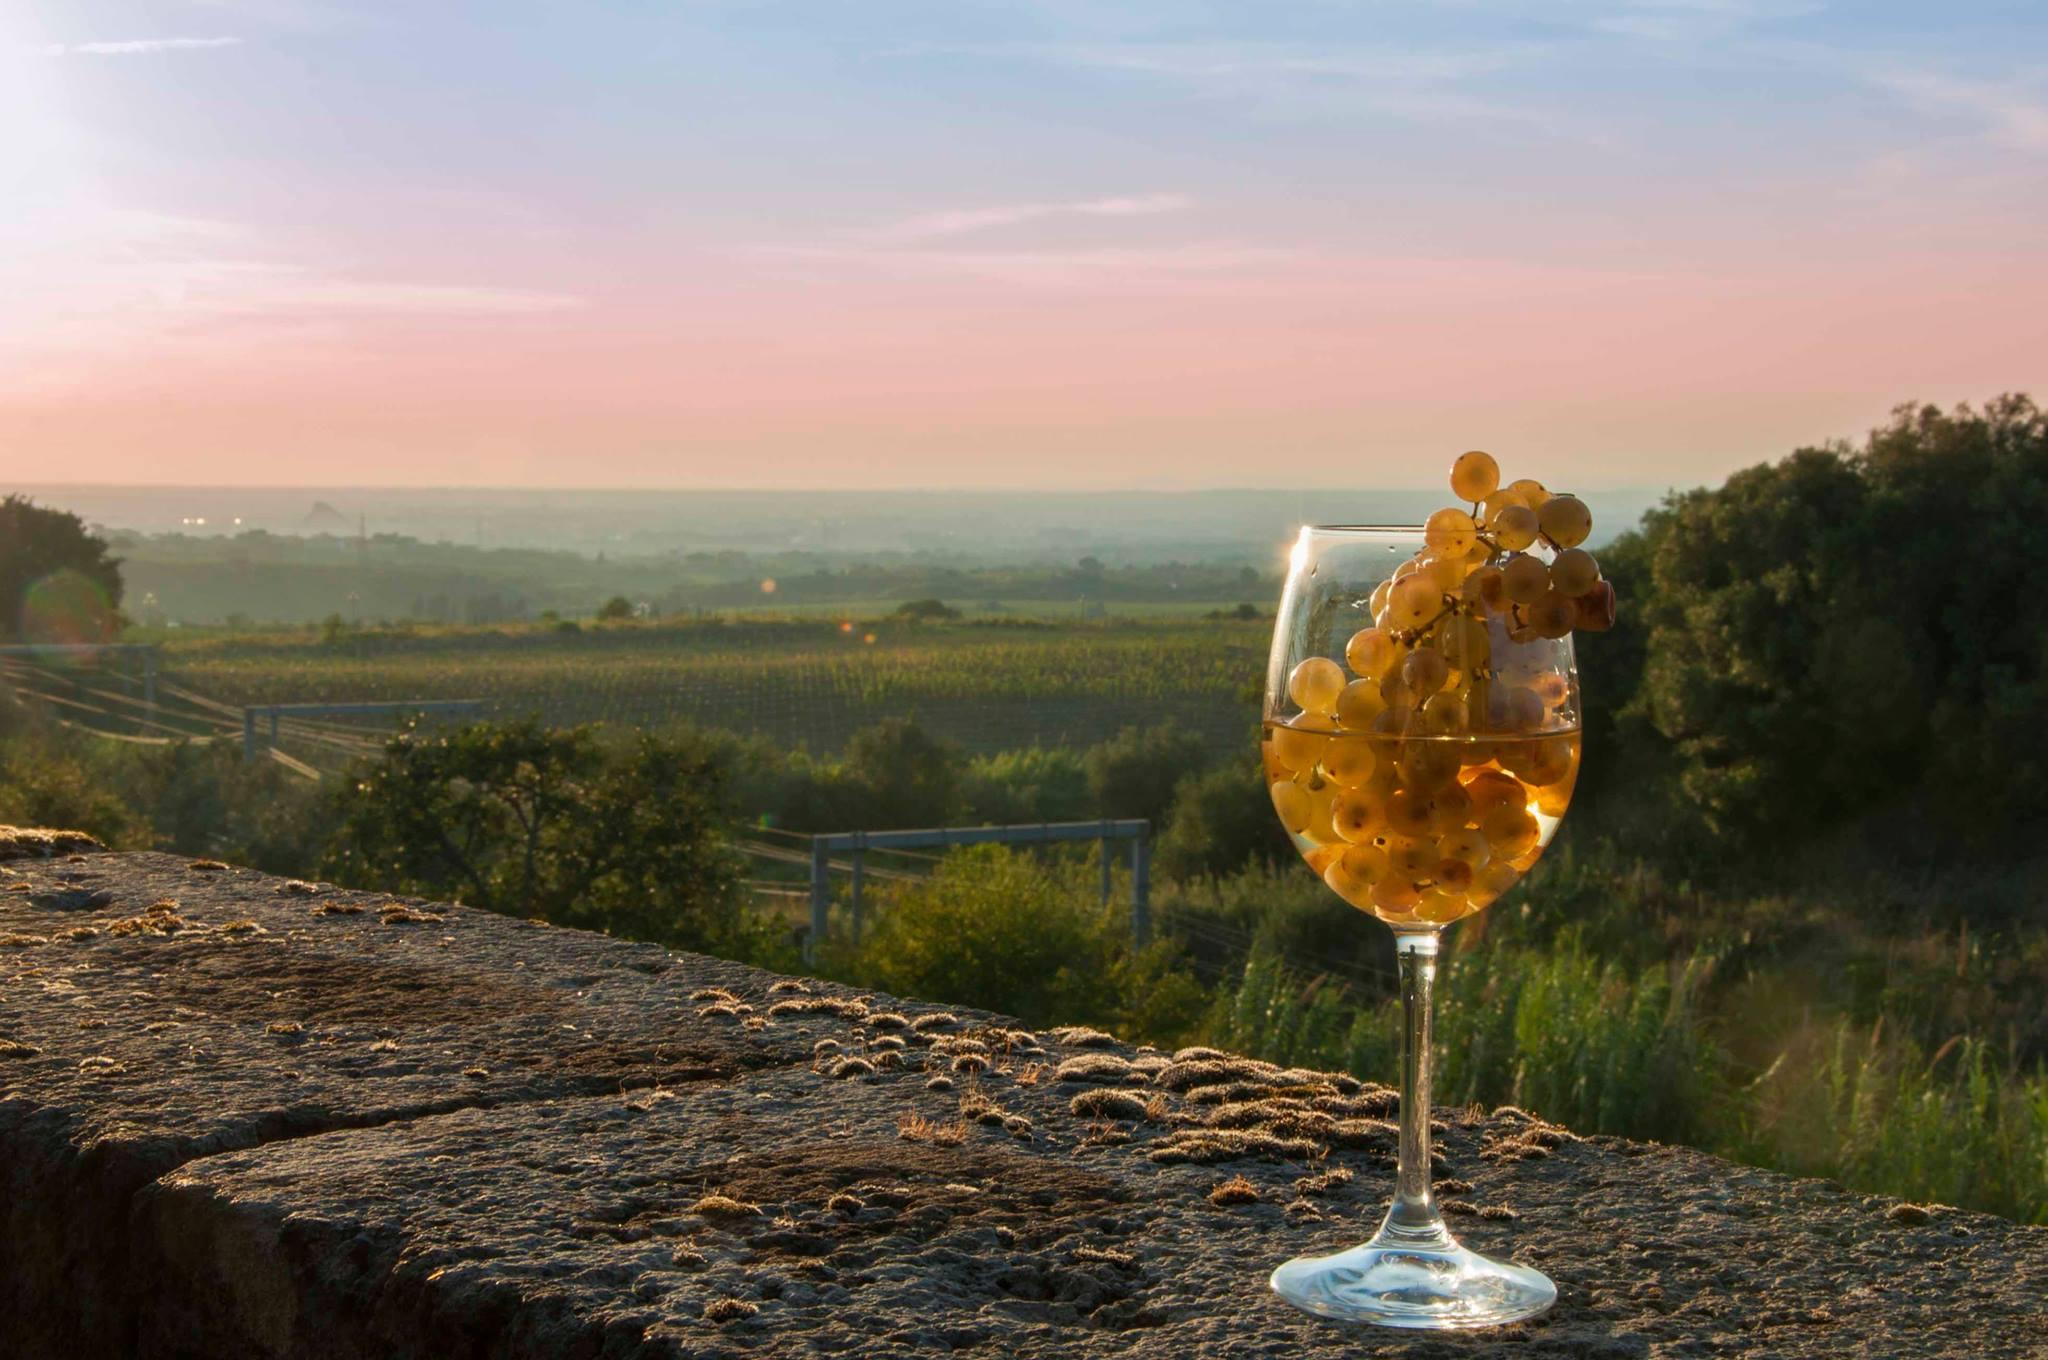 Casale Senni vigneti e uva Frascati